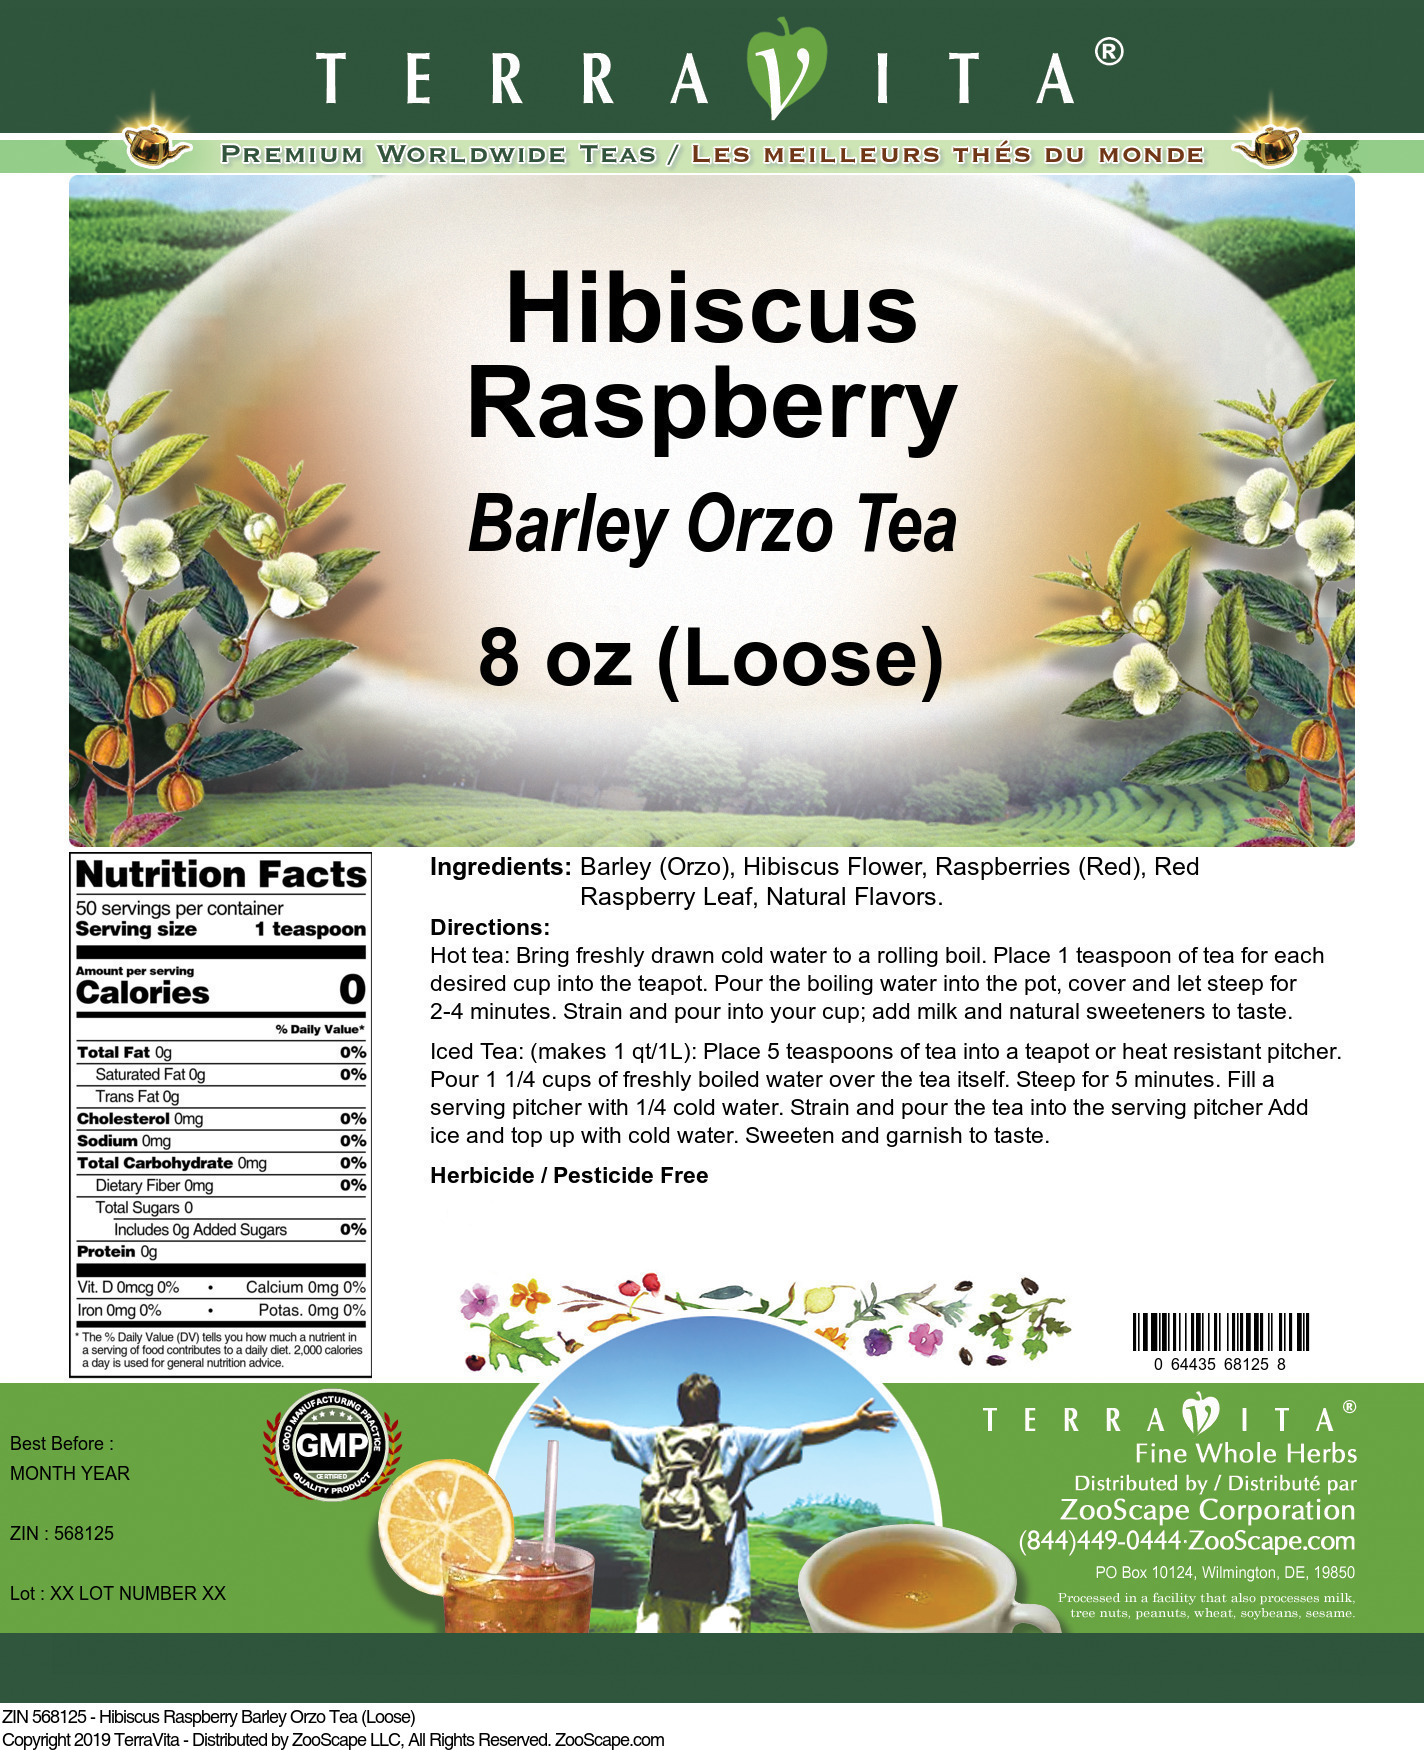 Hibiscus Raspberry Barley Orzo